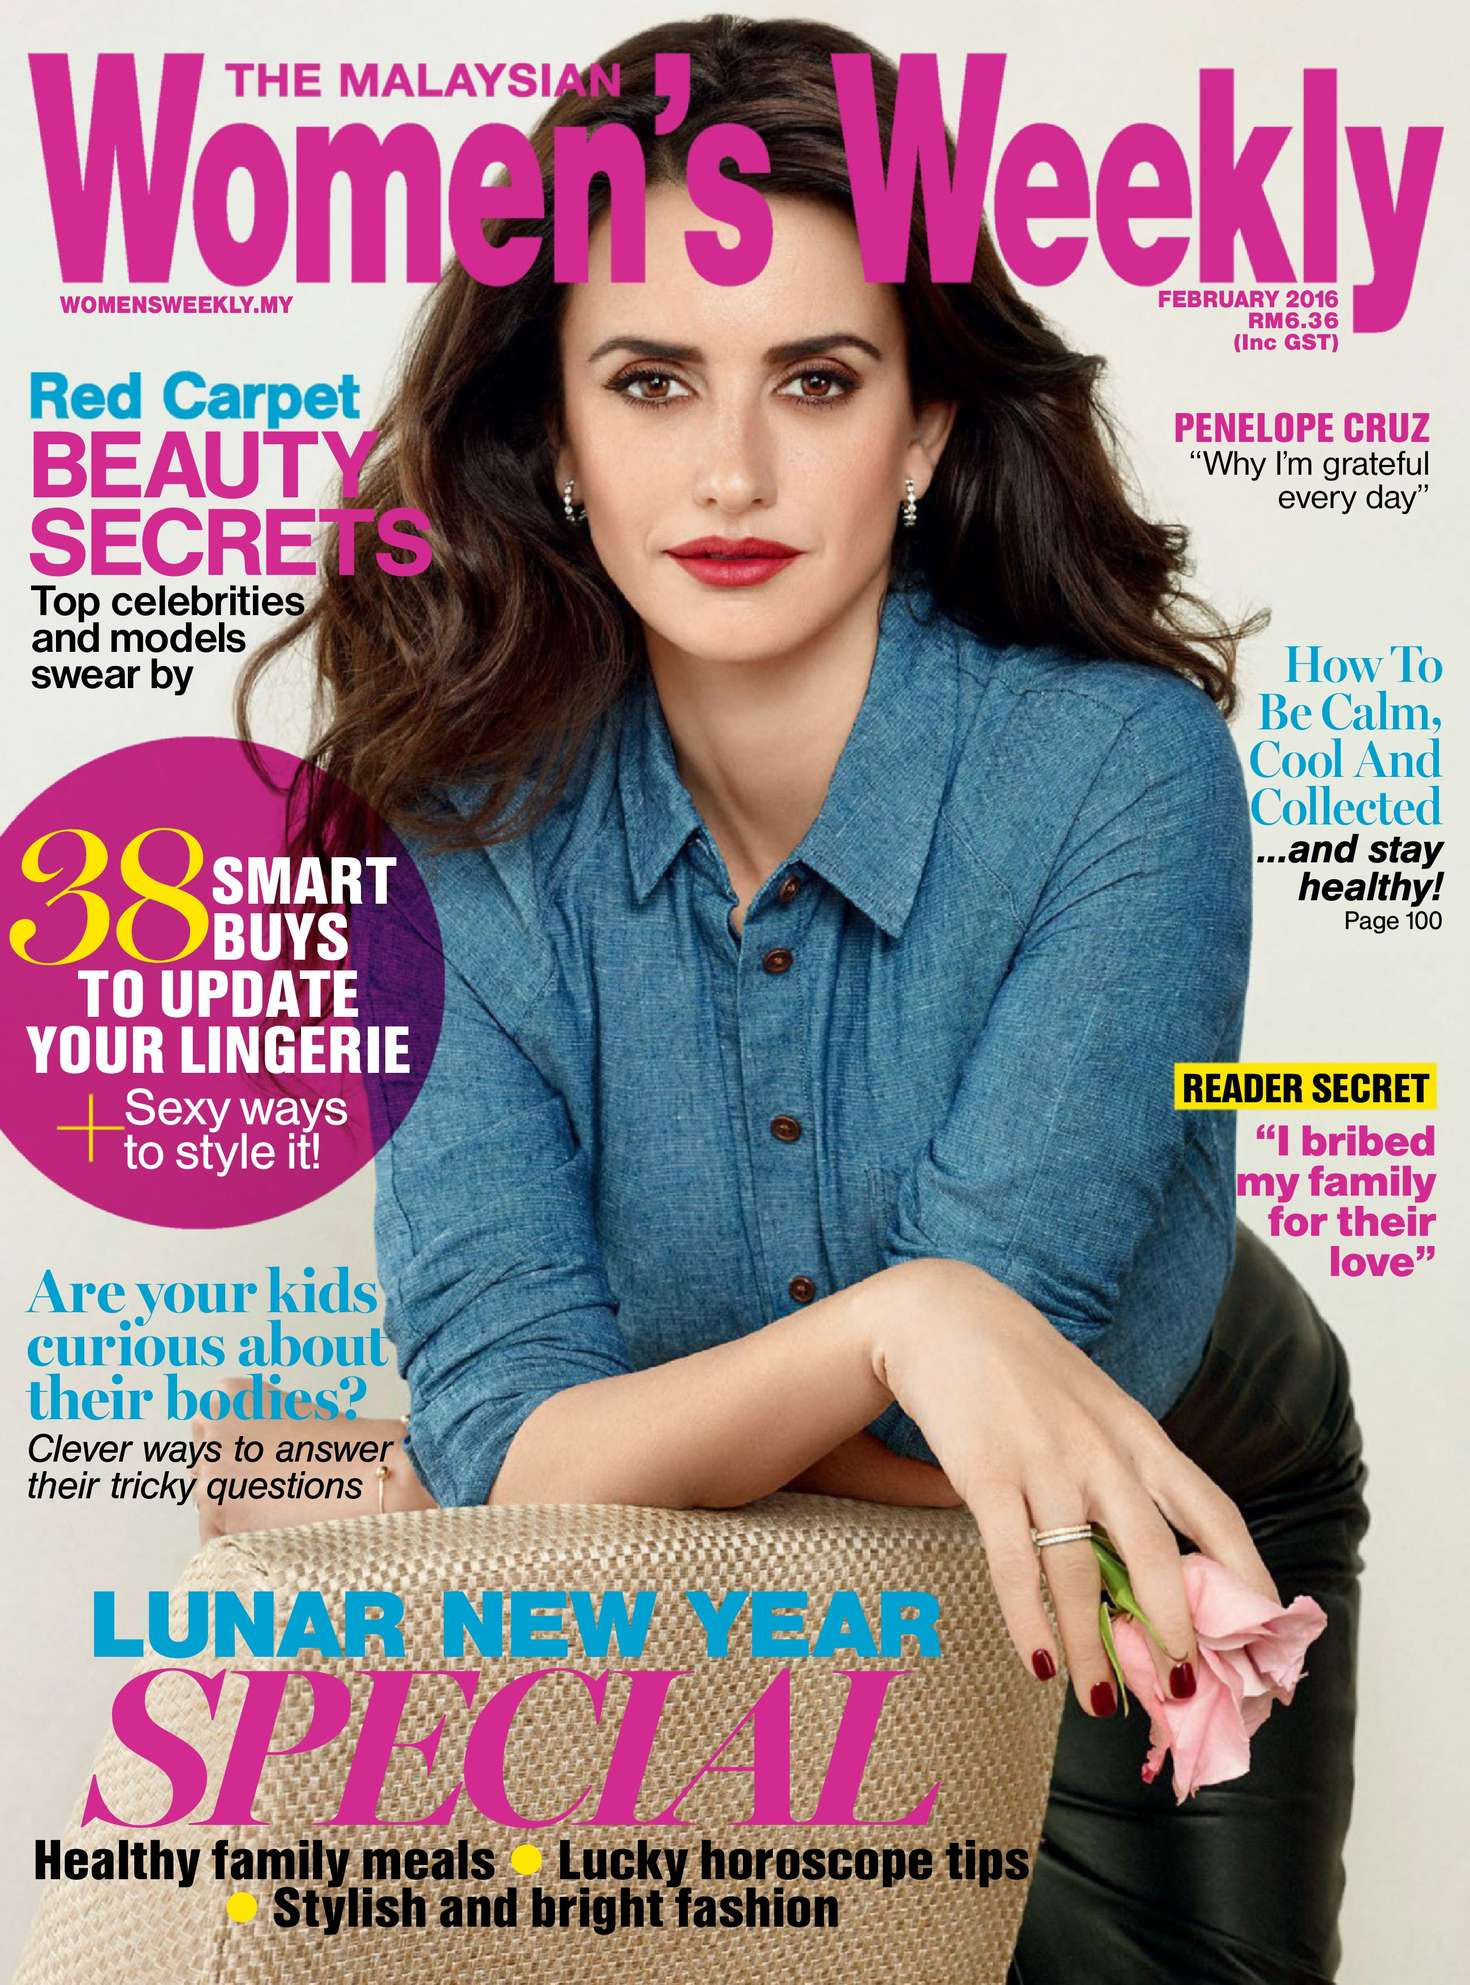 Penelope Cruz - The Malaysian Womens Weekly (February 2016)